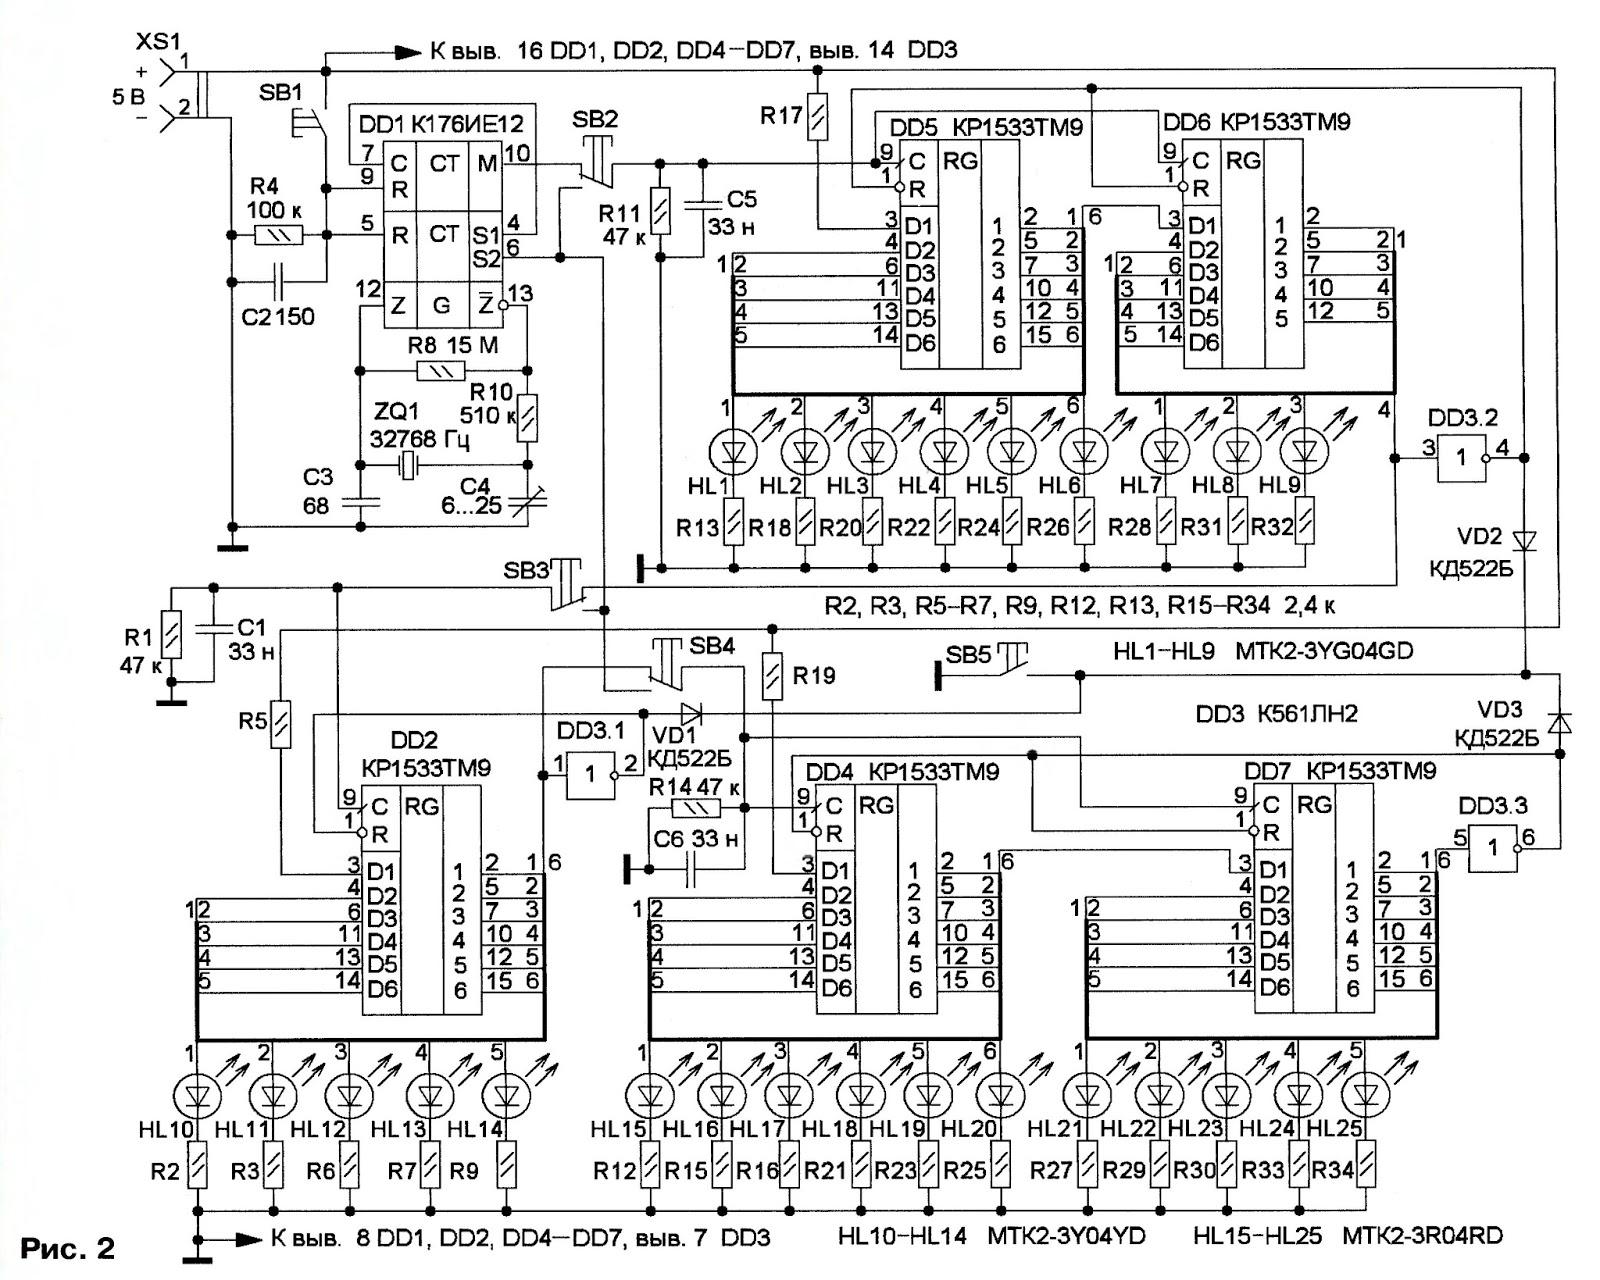 схема подключения электросчетчика vfhrbhjdrf ghjdjljd